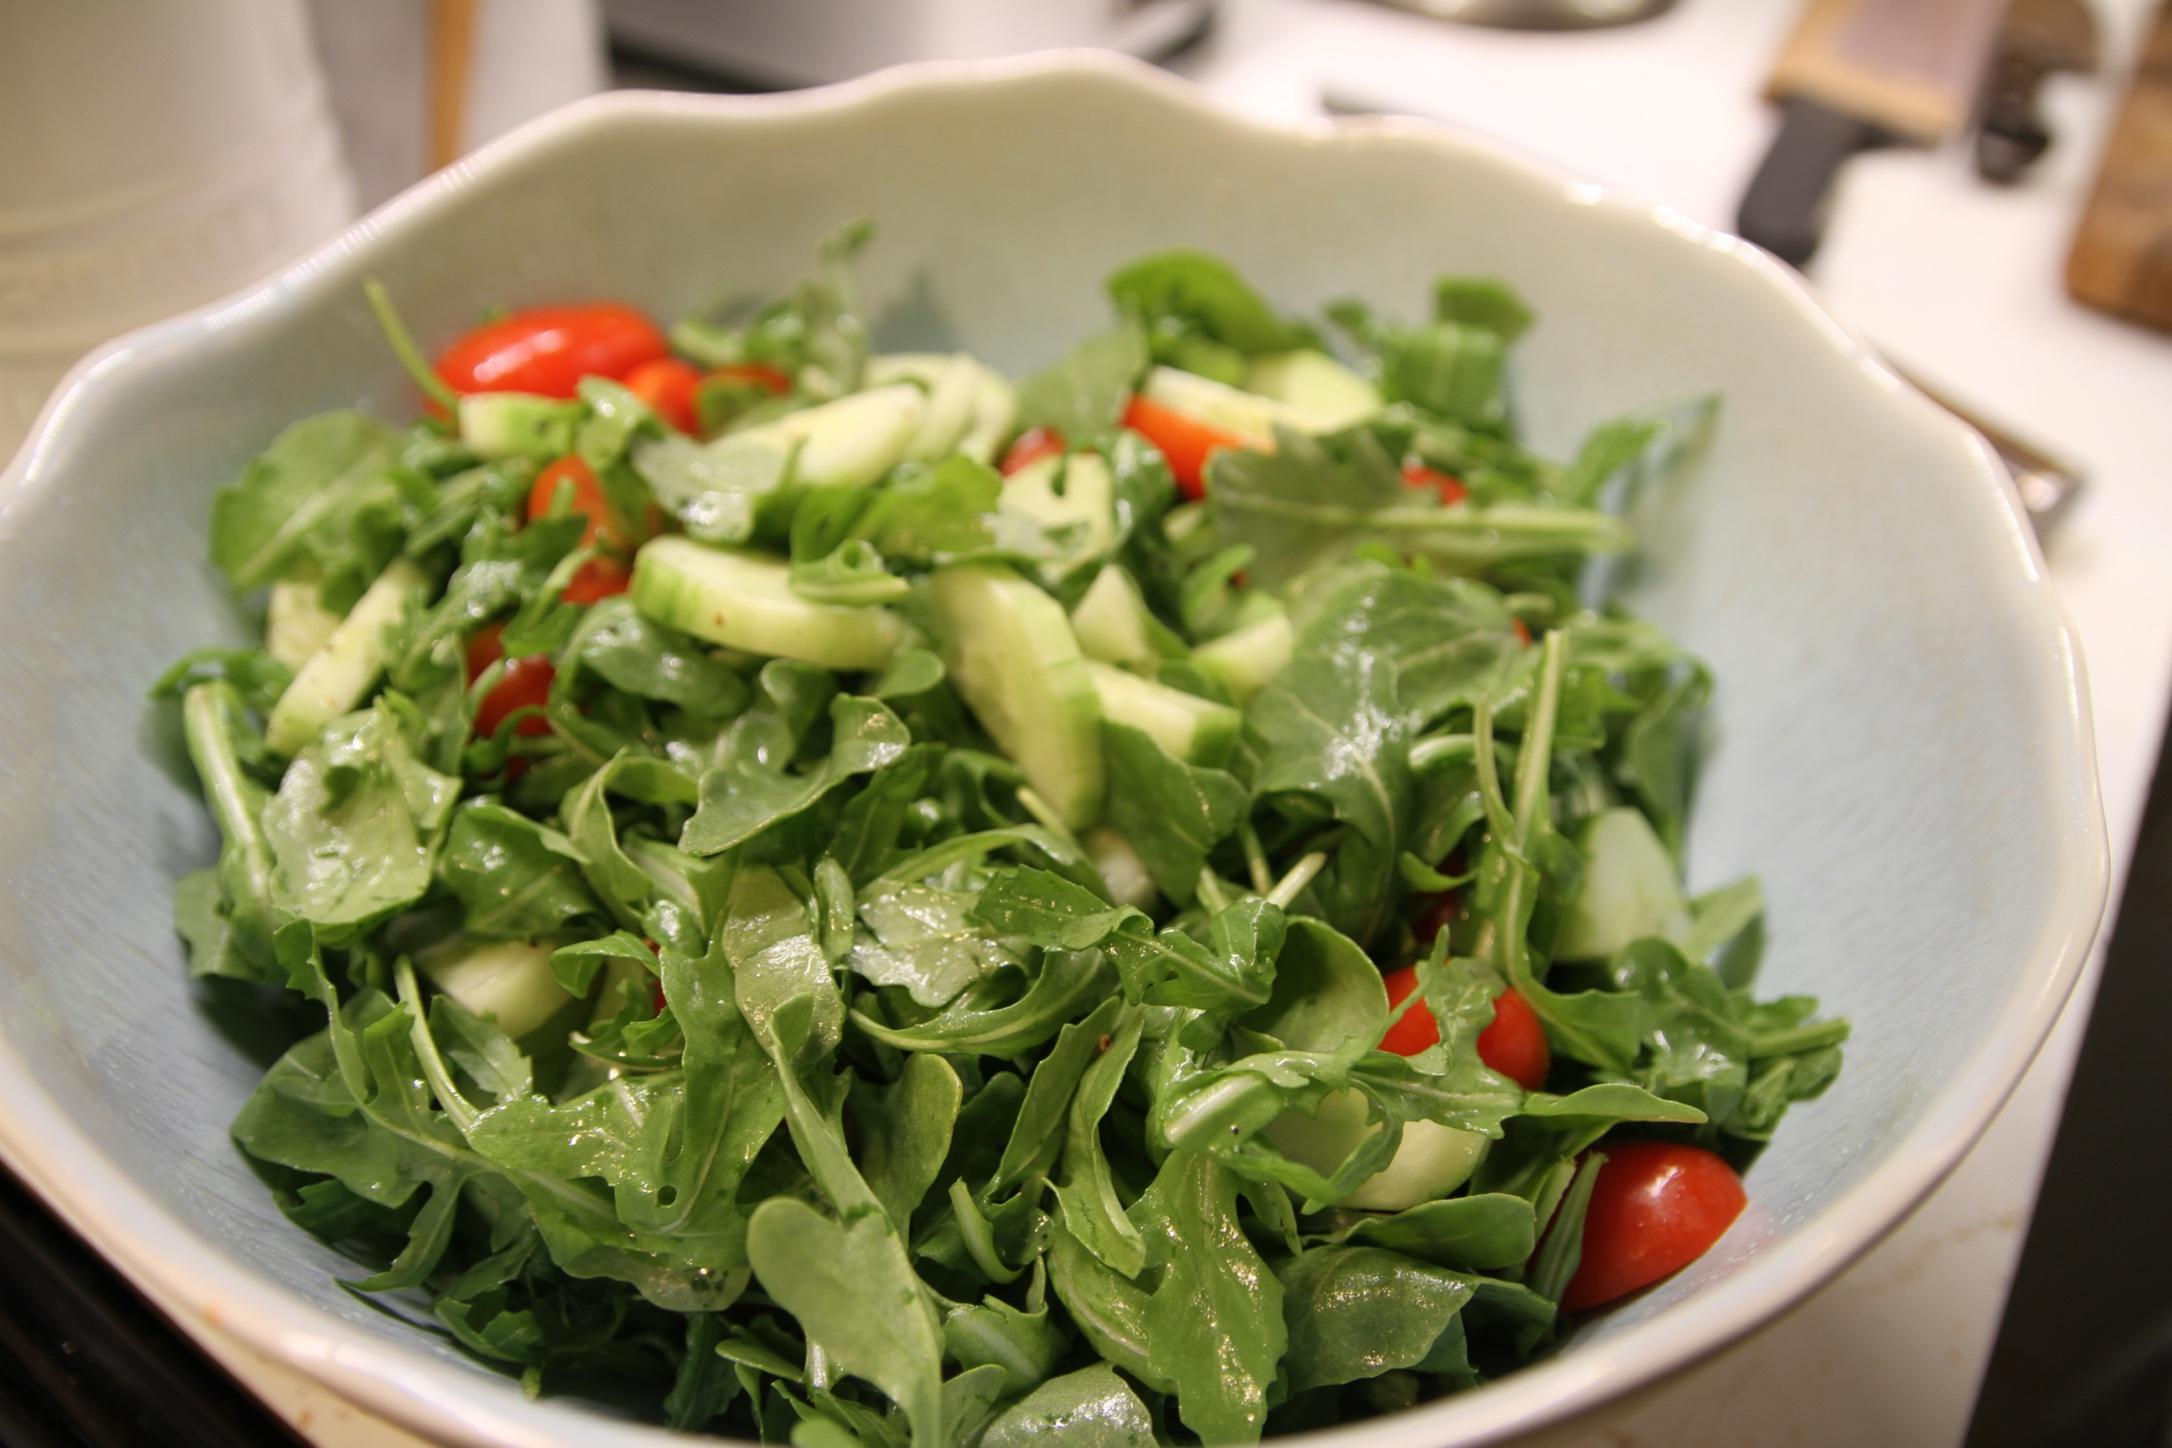 The salad was awesome, too. Yay arugula!